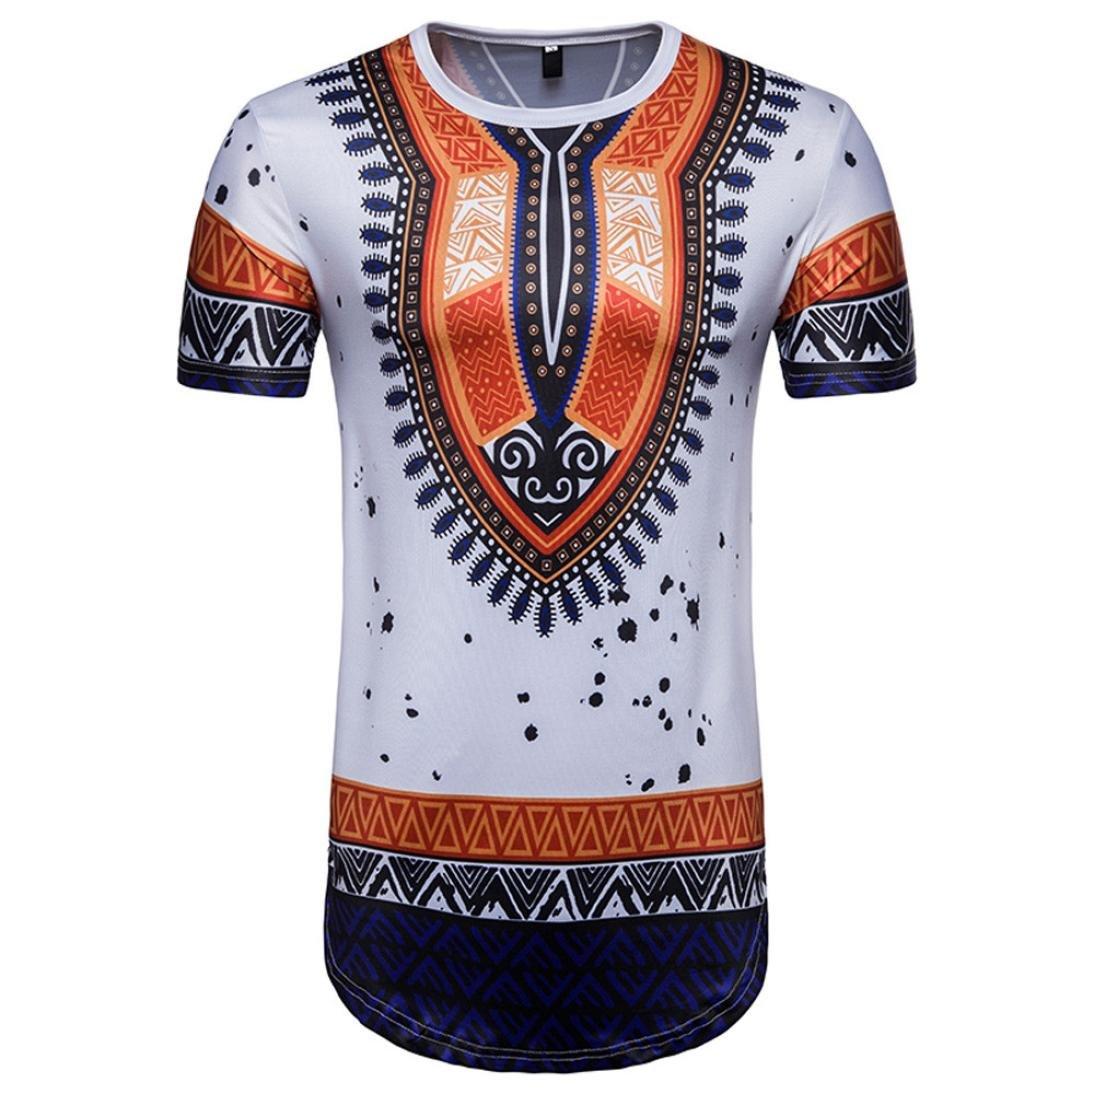 Vanvler Men African Print Shirt, Male [ Short Sleeve T-shirt ] Hipster Blouse Vintage Top (2XL, WHITE)